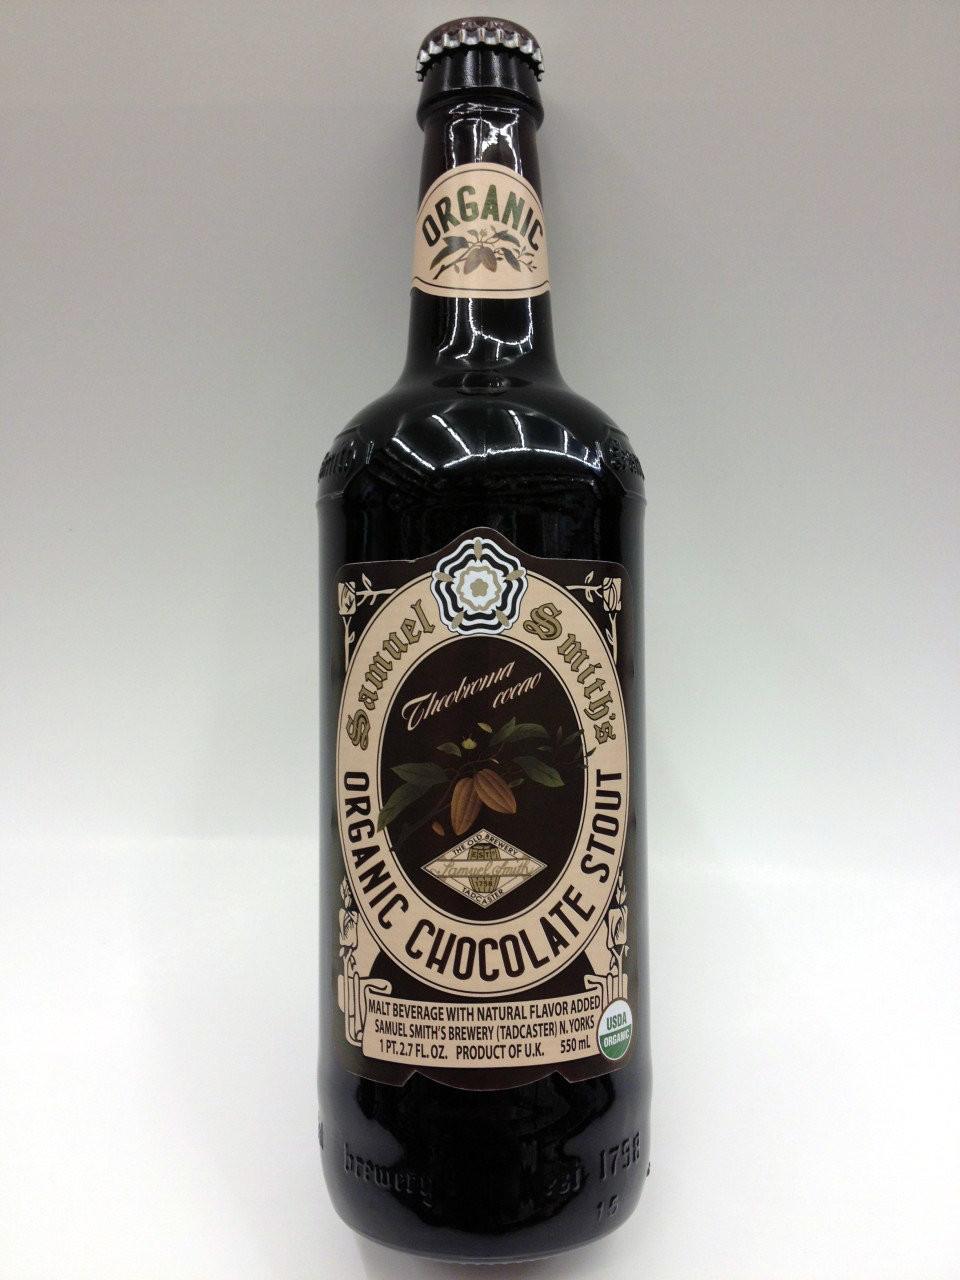 Samuel Smith Organic Chocolate Stout | Quality Liquor Store